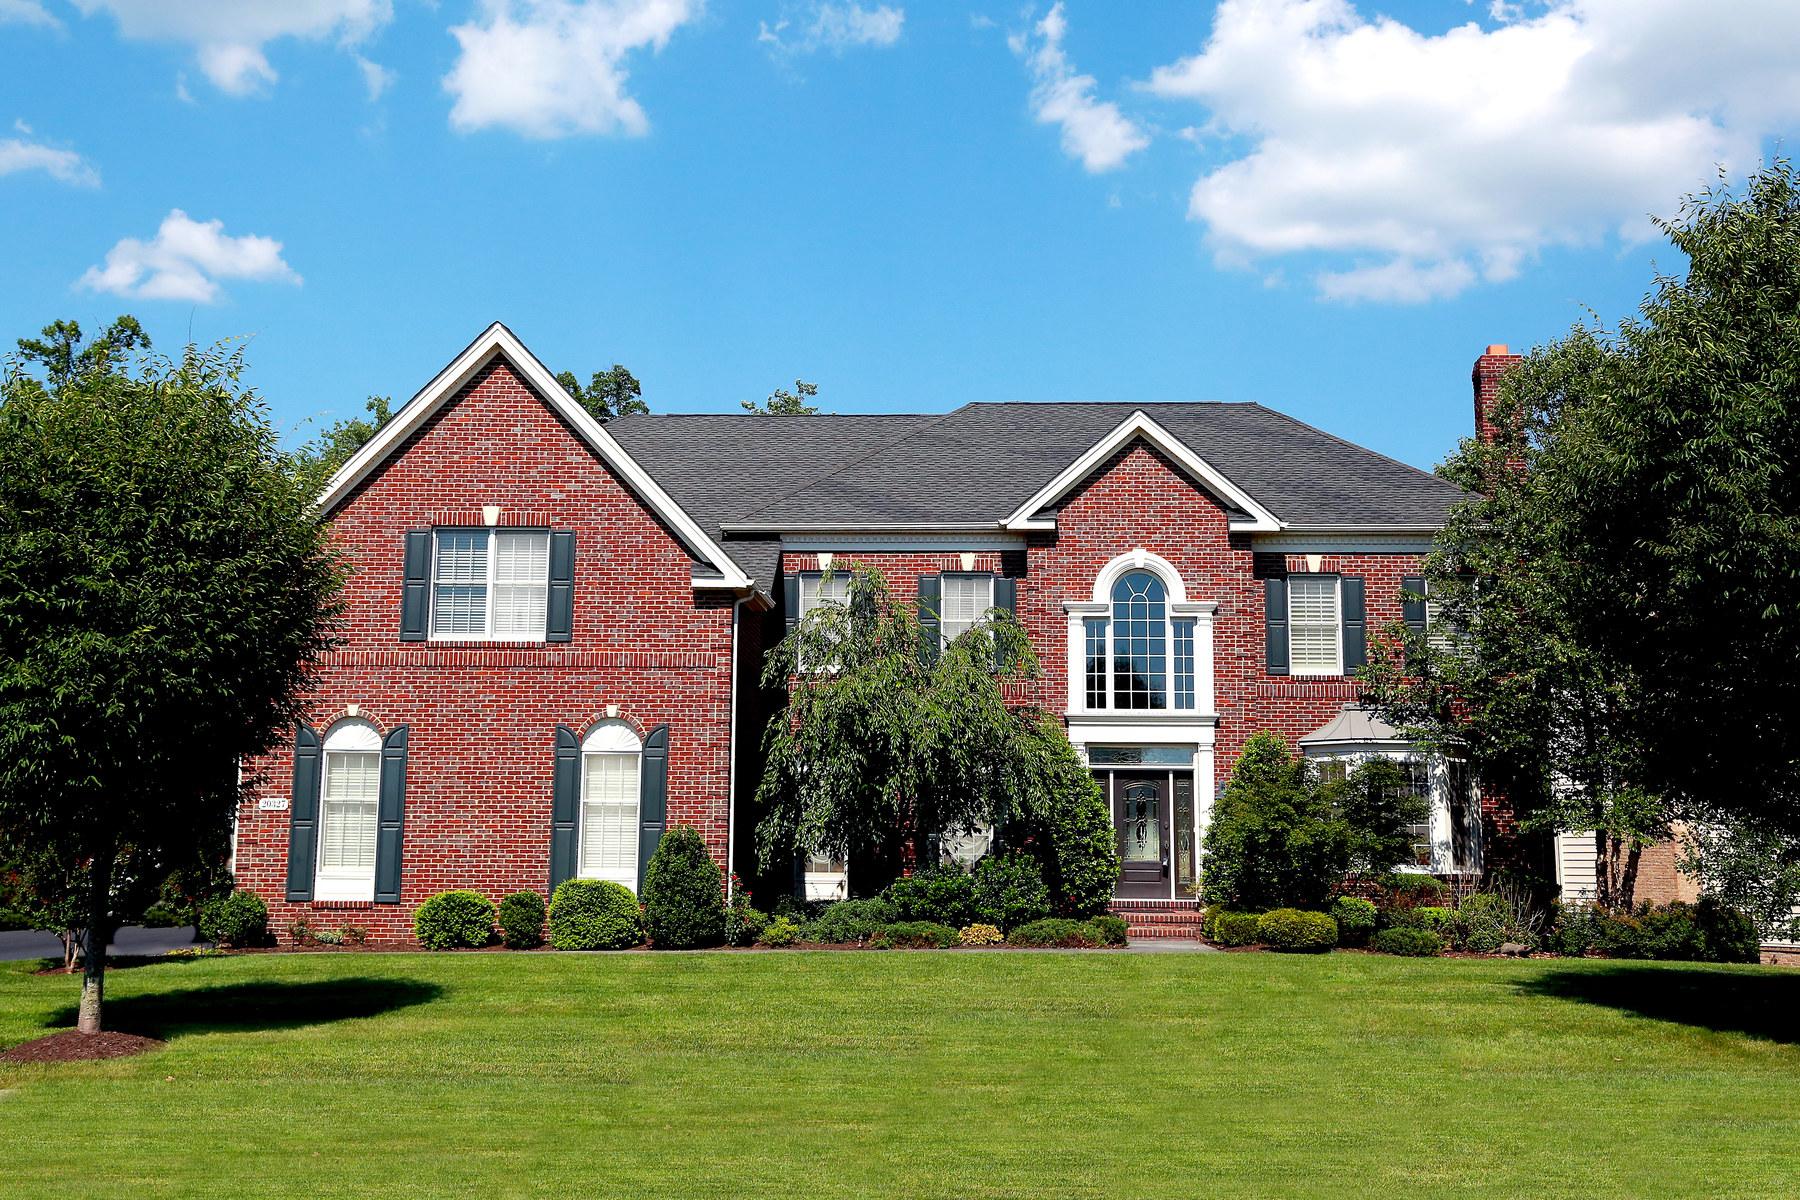 Single Family Home for Sale at 20327 Kiawah Island Drive, Ashburn Ashburn, Virginia 20147 United States